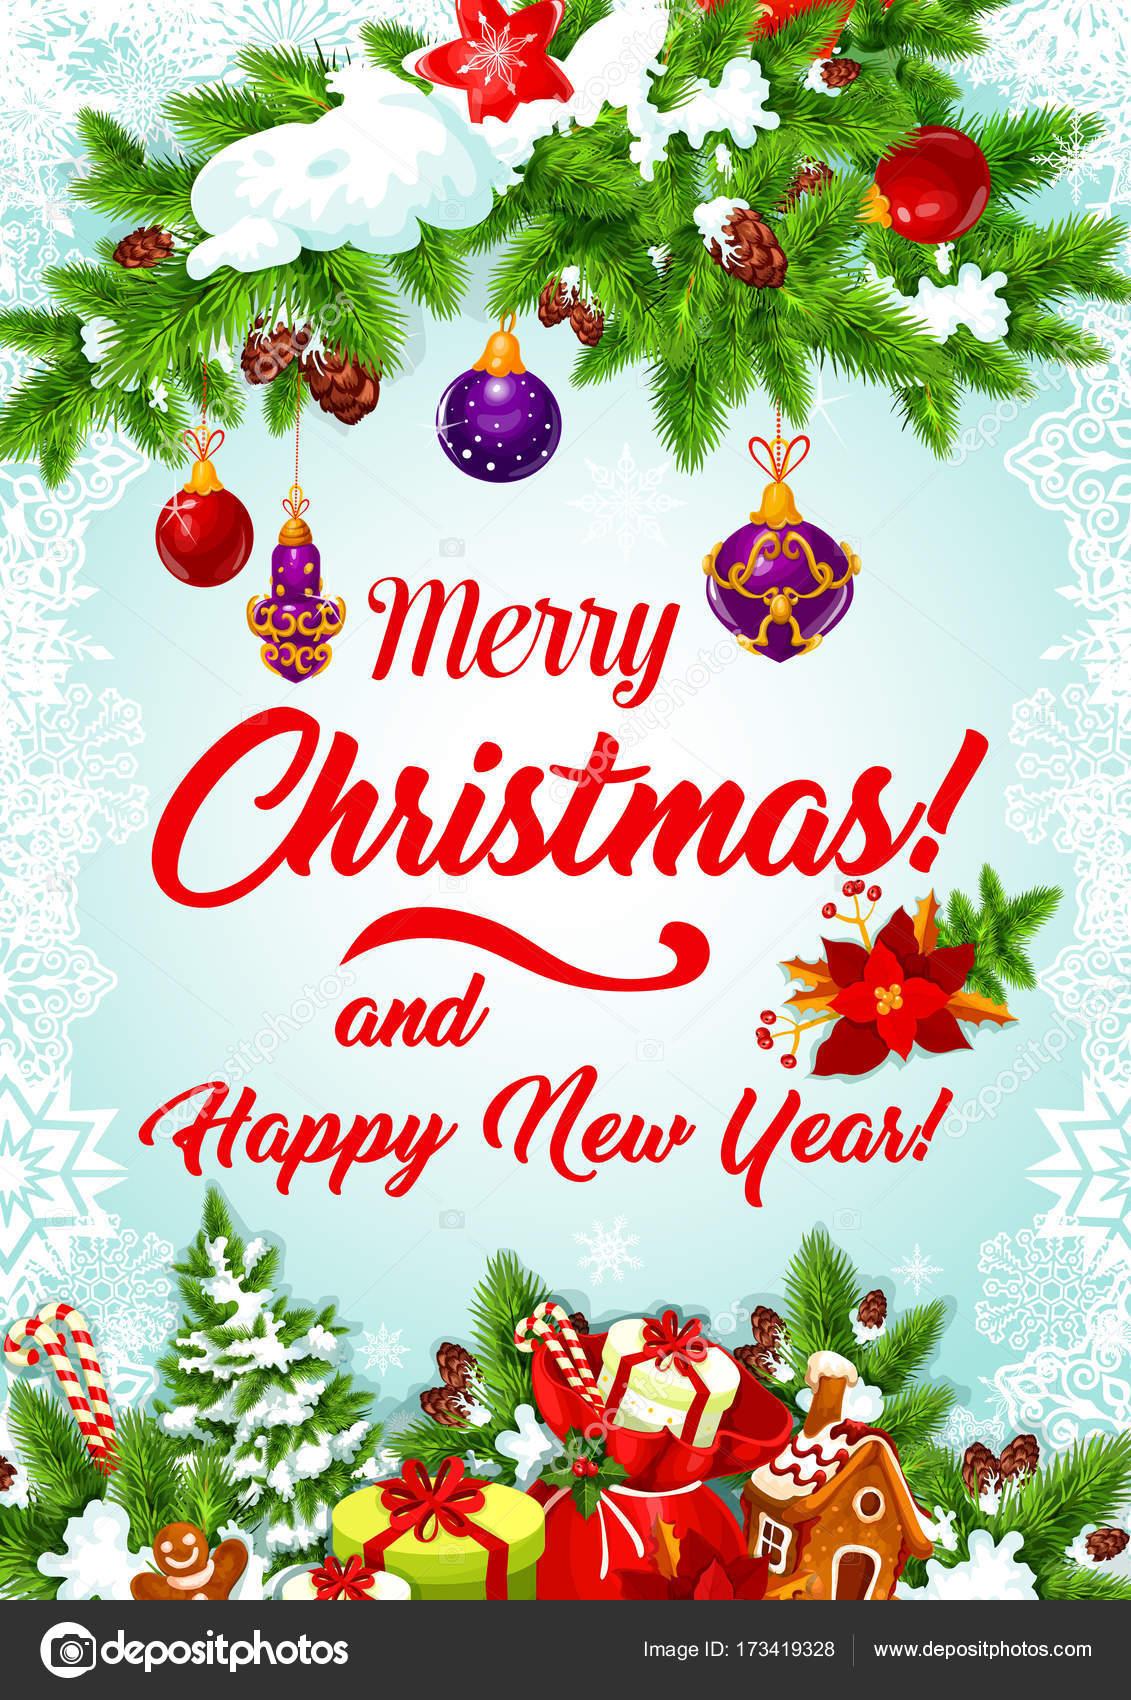 Weihnachtsbaum Girlande.Weihnachtsbaum Girlande Für Neujahr Grußkarte Stockvektor